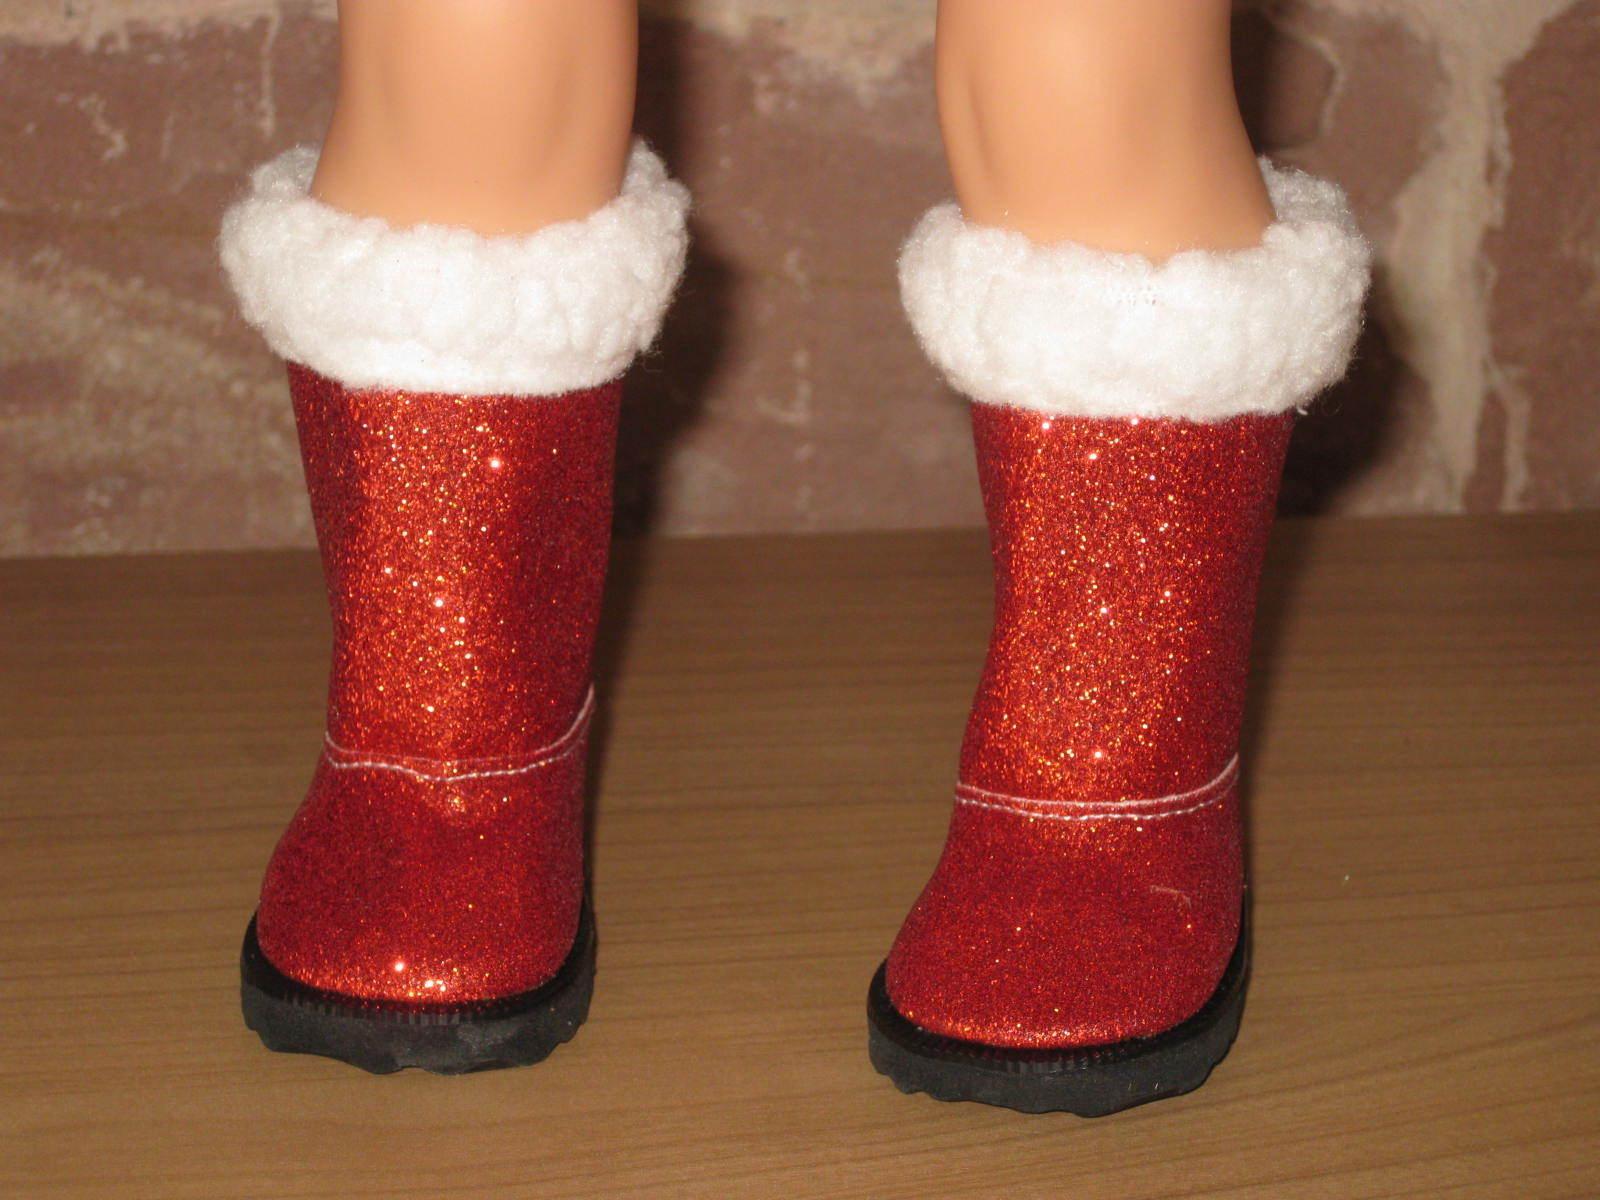 Nikolaus botas, zapatos, muñecas zapatos, 7,2cm, 7,2cm, 7,2cm, rojo, 46-50cm pie-muñeca, 1686 edf918